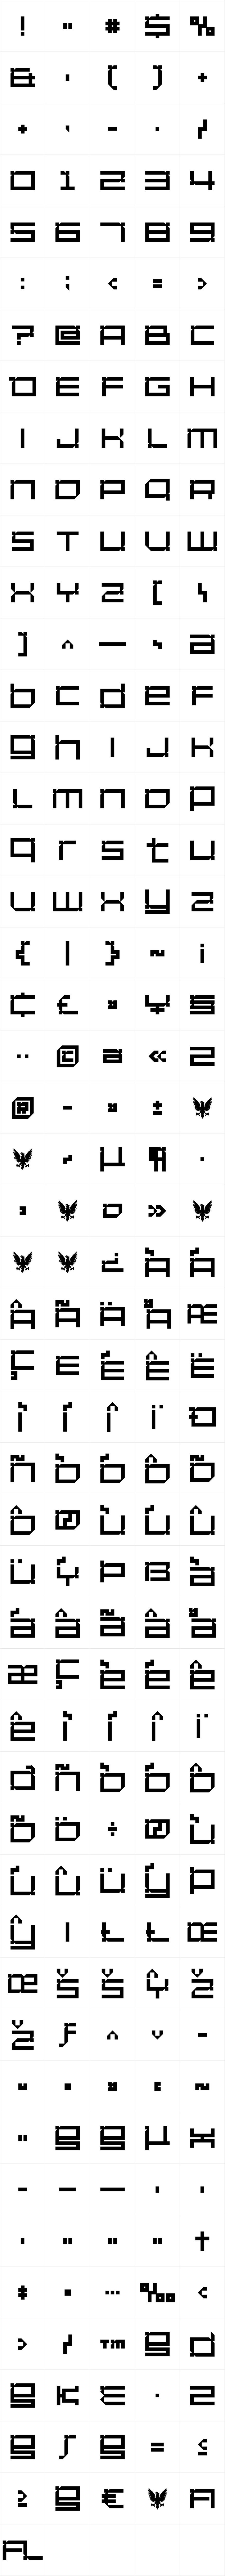 YWFT DesignGraphik Bold